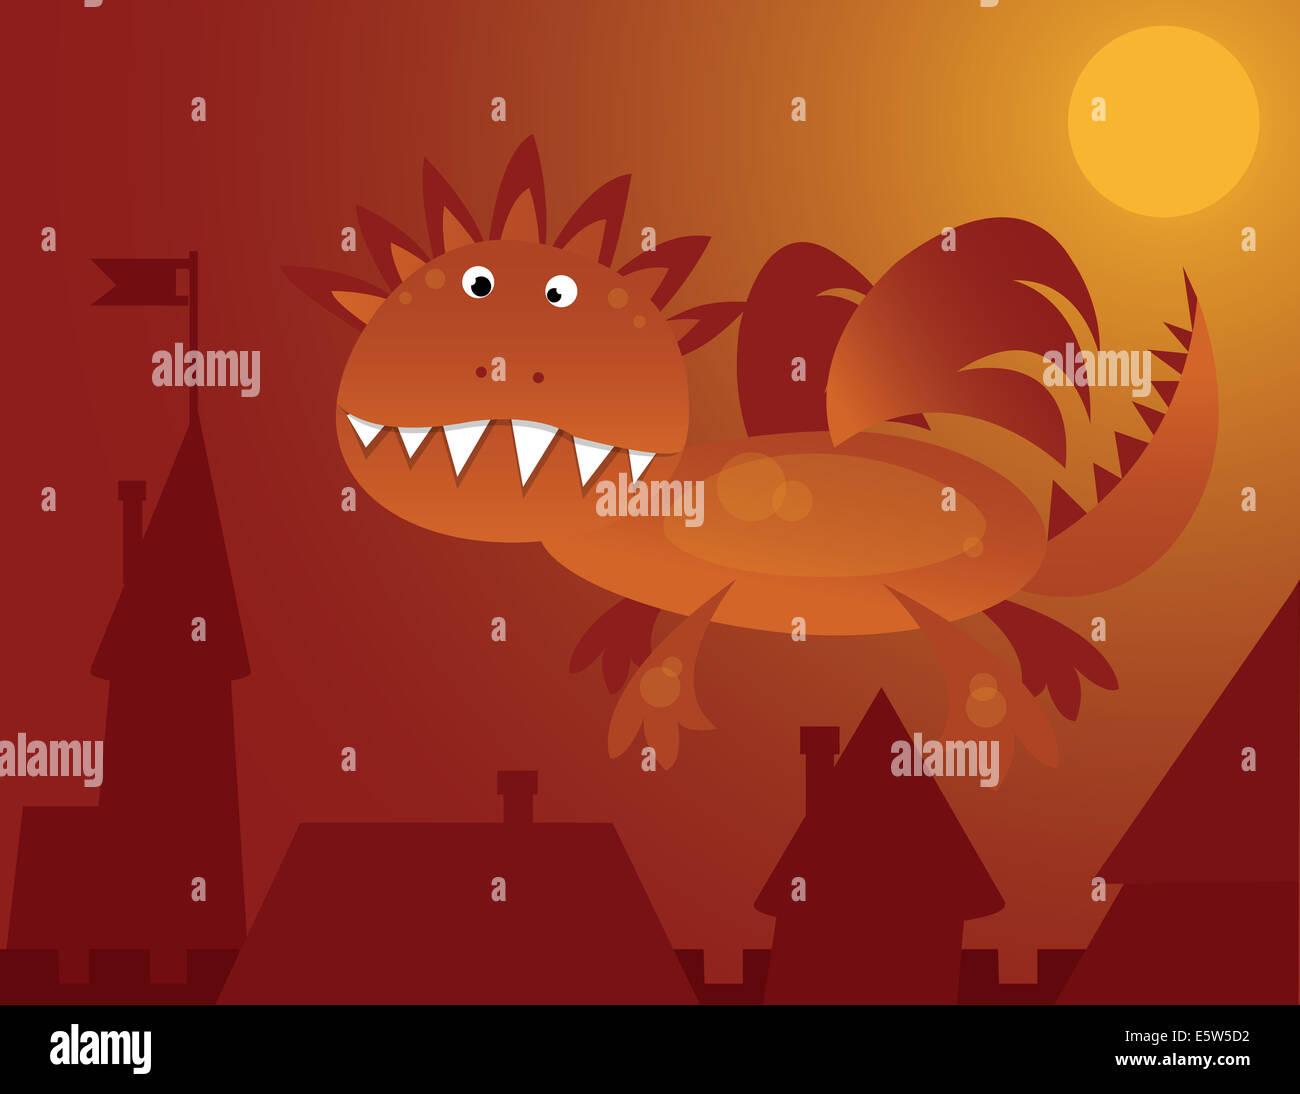 orange dragon flying over the city - Stock Image